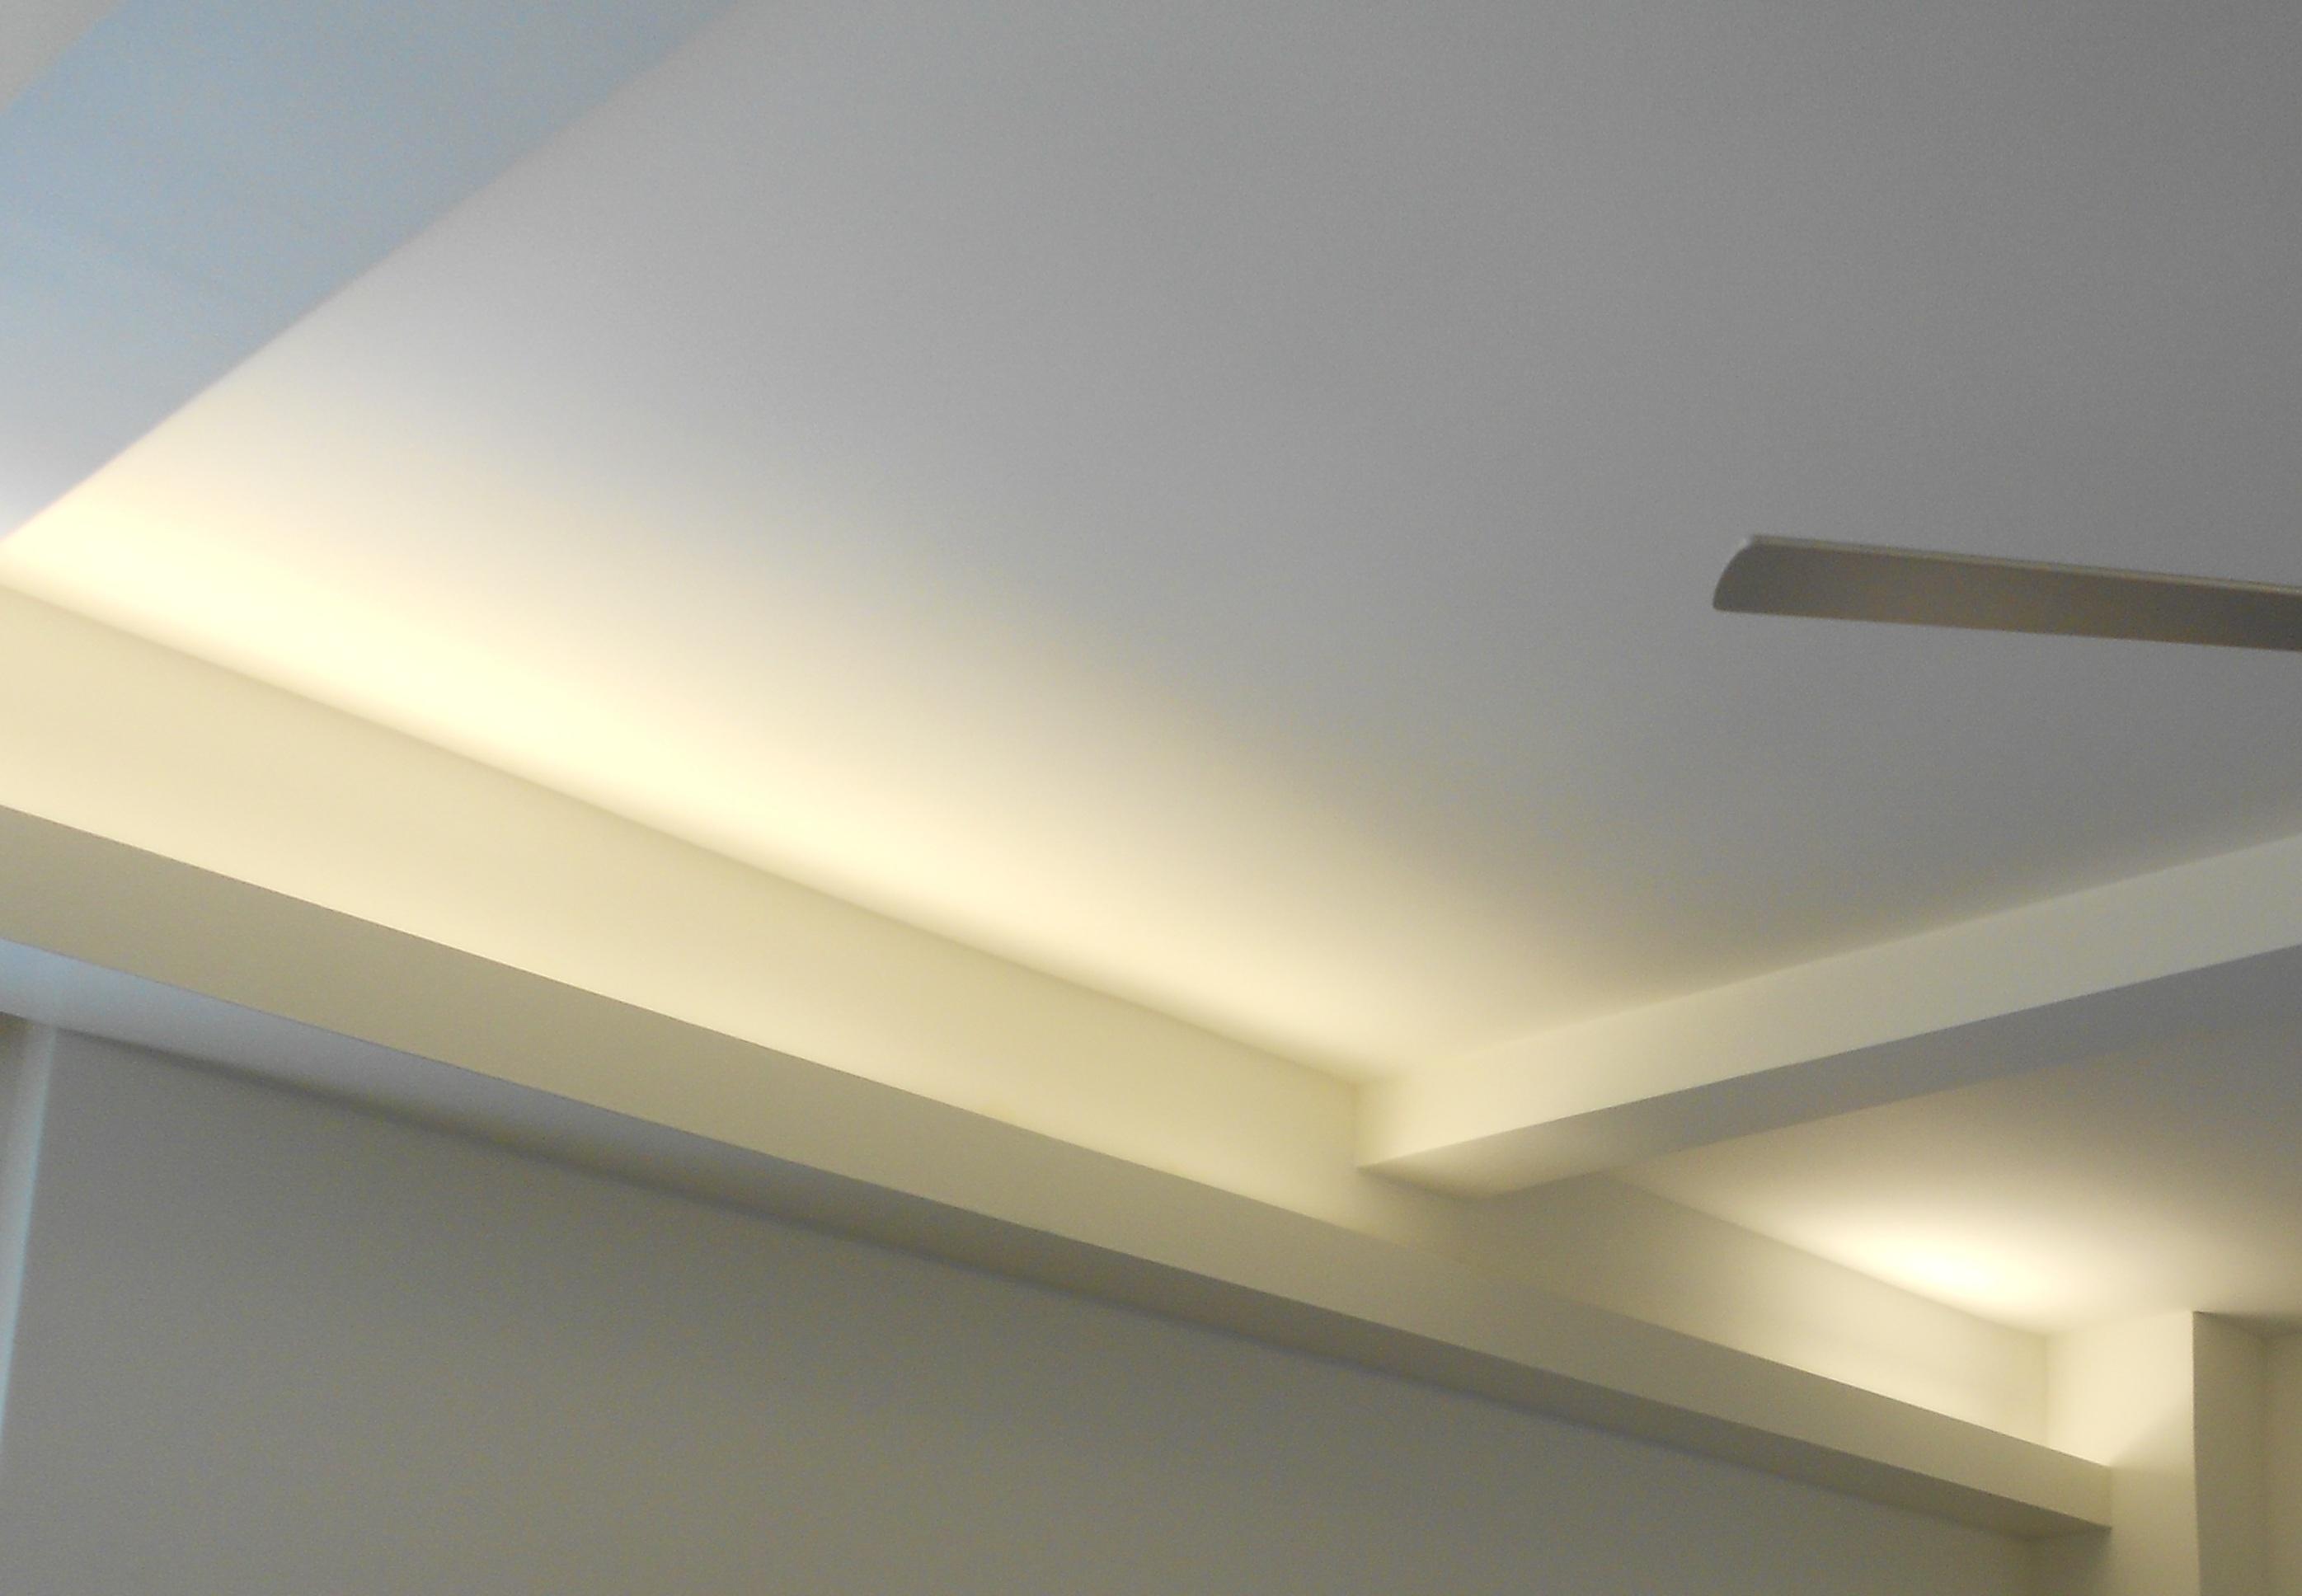 8 0309 Mood Board On Classic Interior Saveenlarge Led Cove Lighting